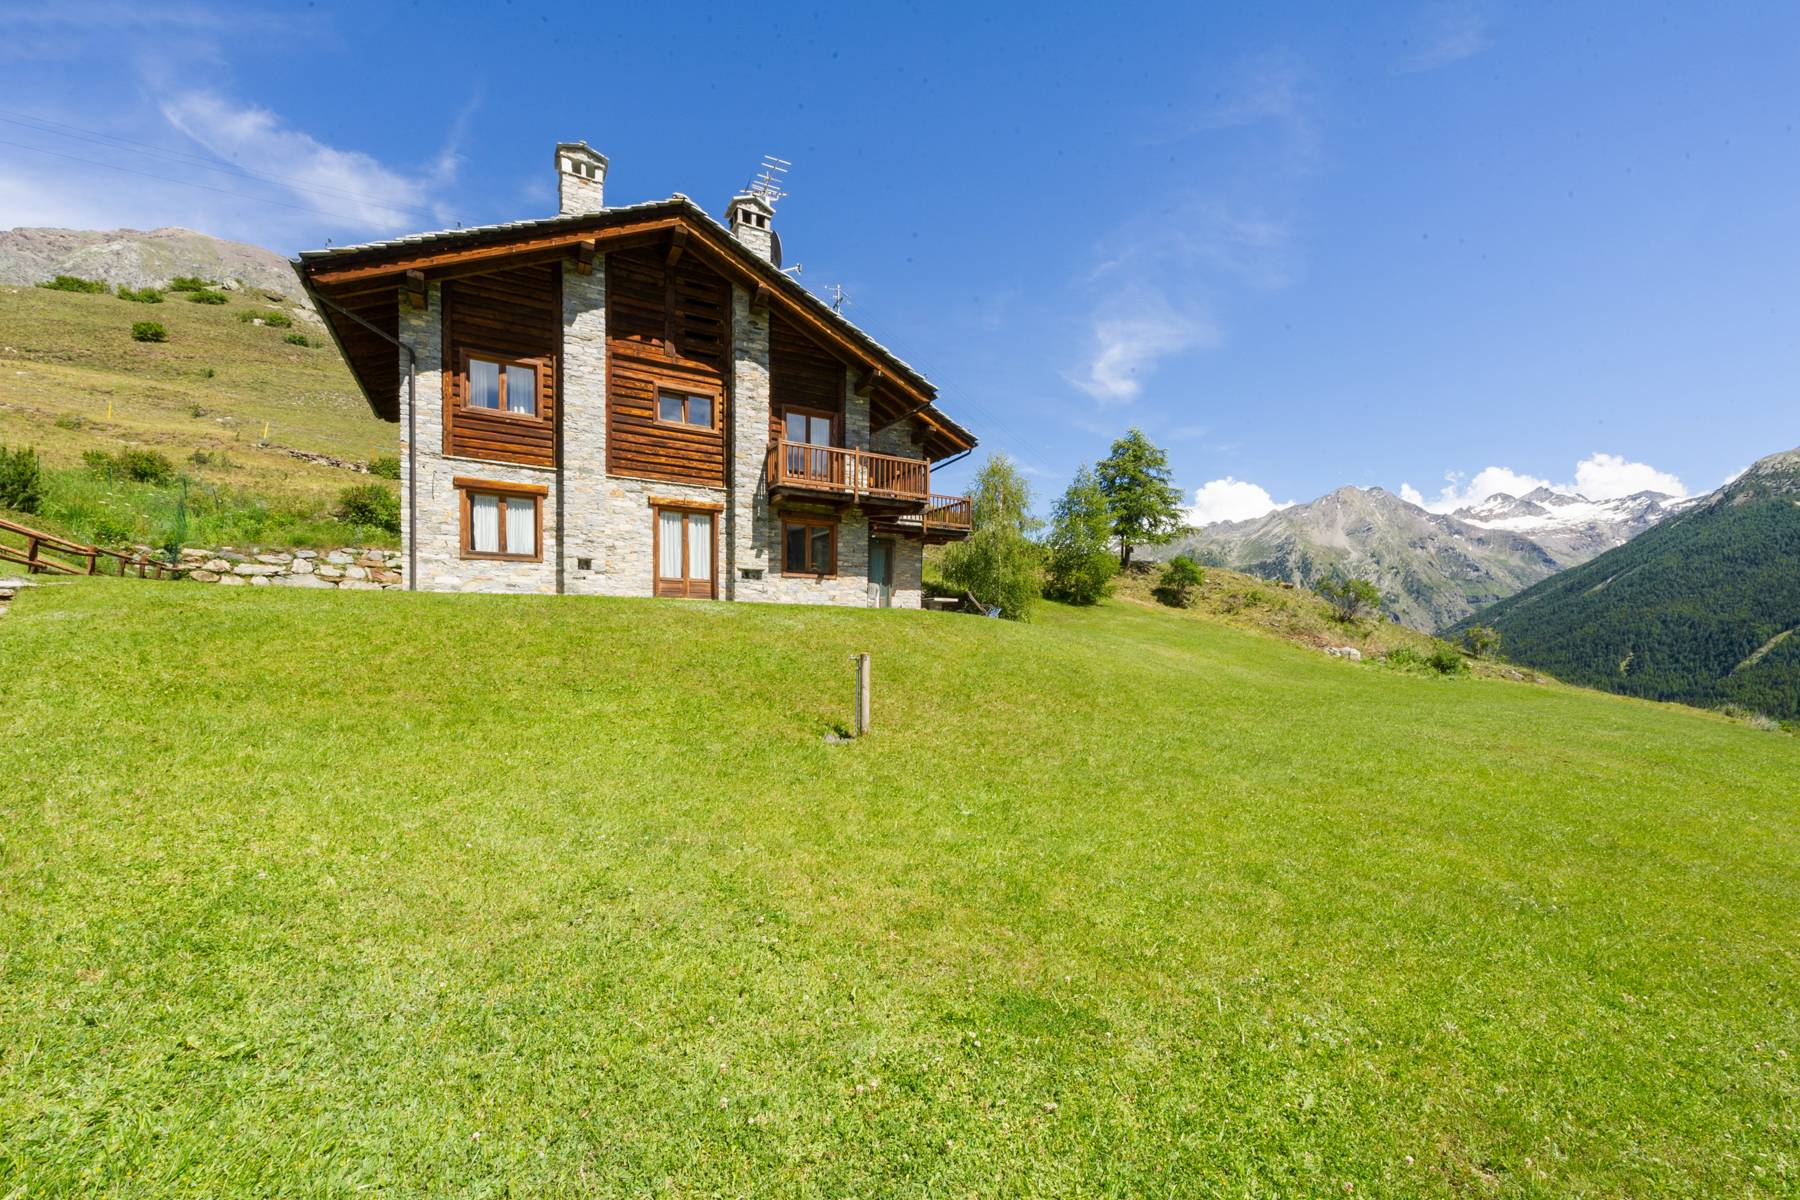 Villa in Vendita a Cogne: 5 locali, 377 mq - Foto 15